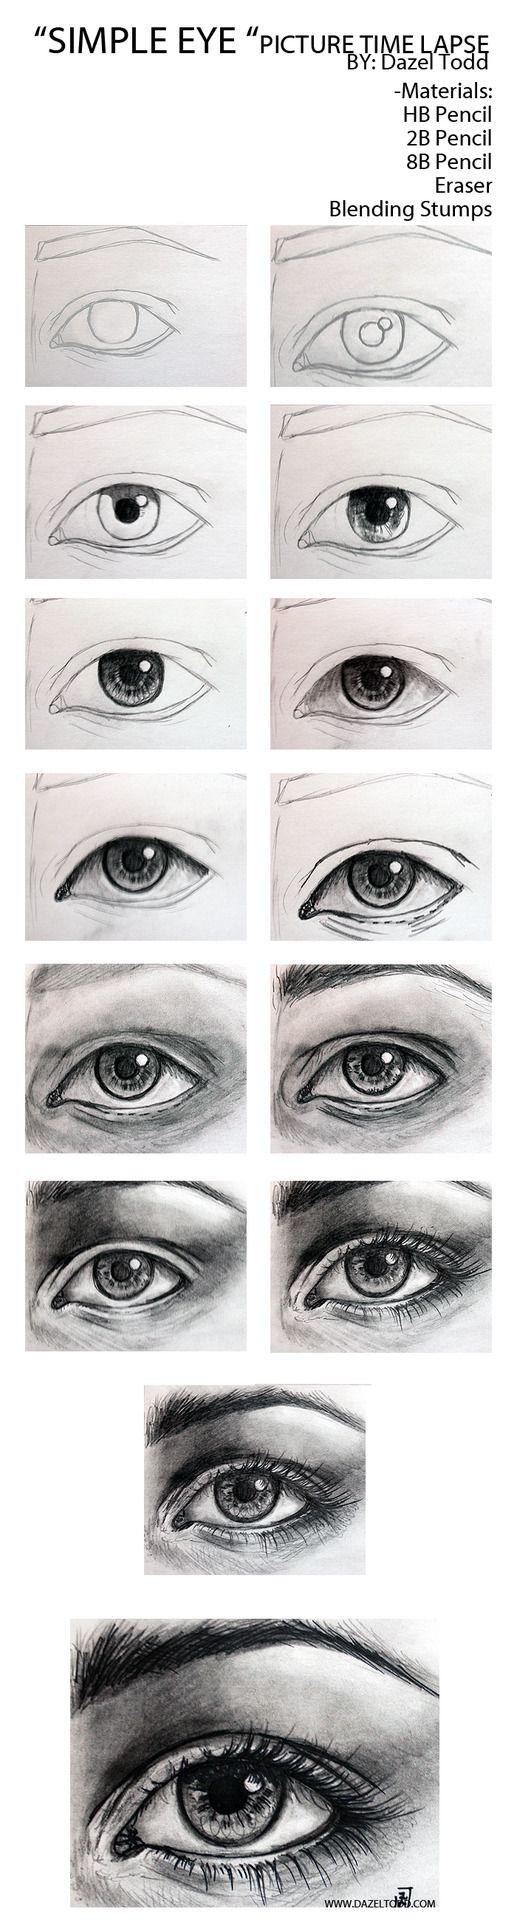 Dazel Todd Sketch of eye tutorial, drawing tips.